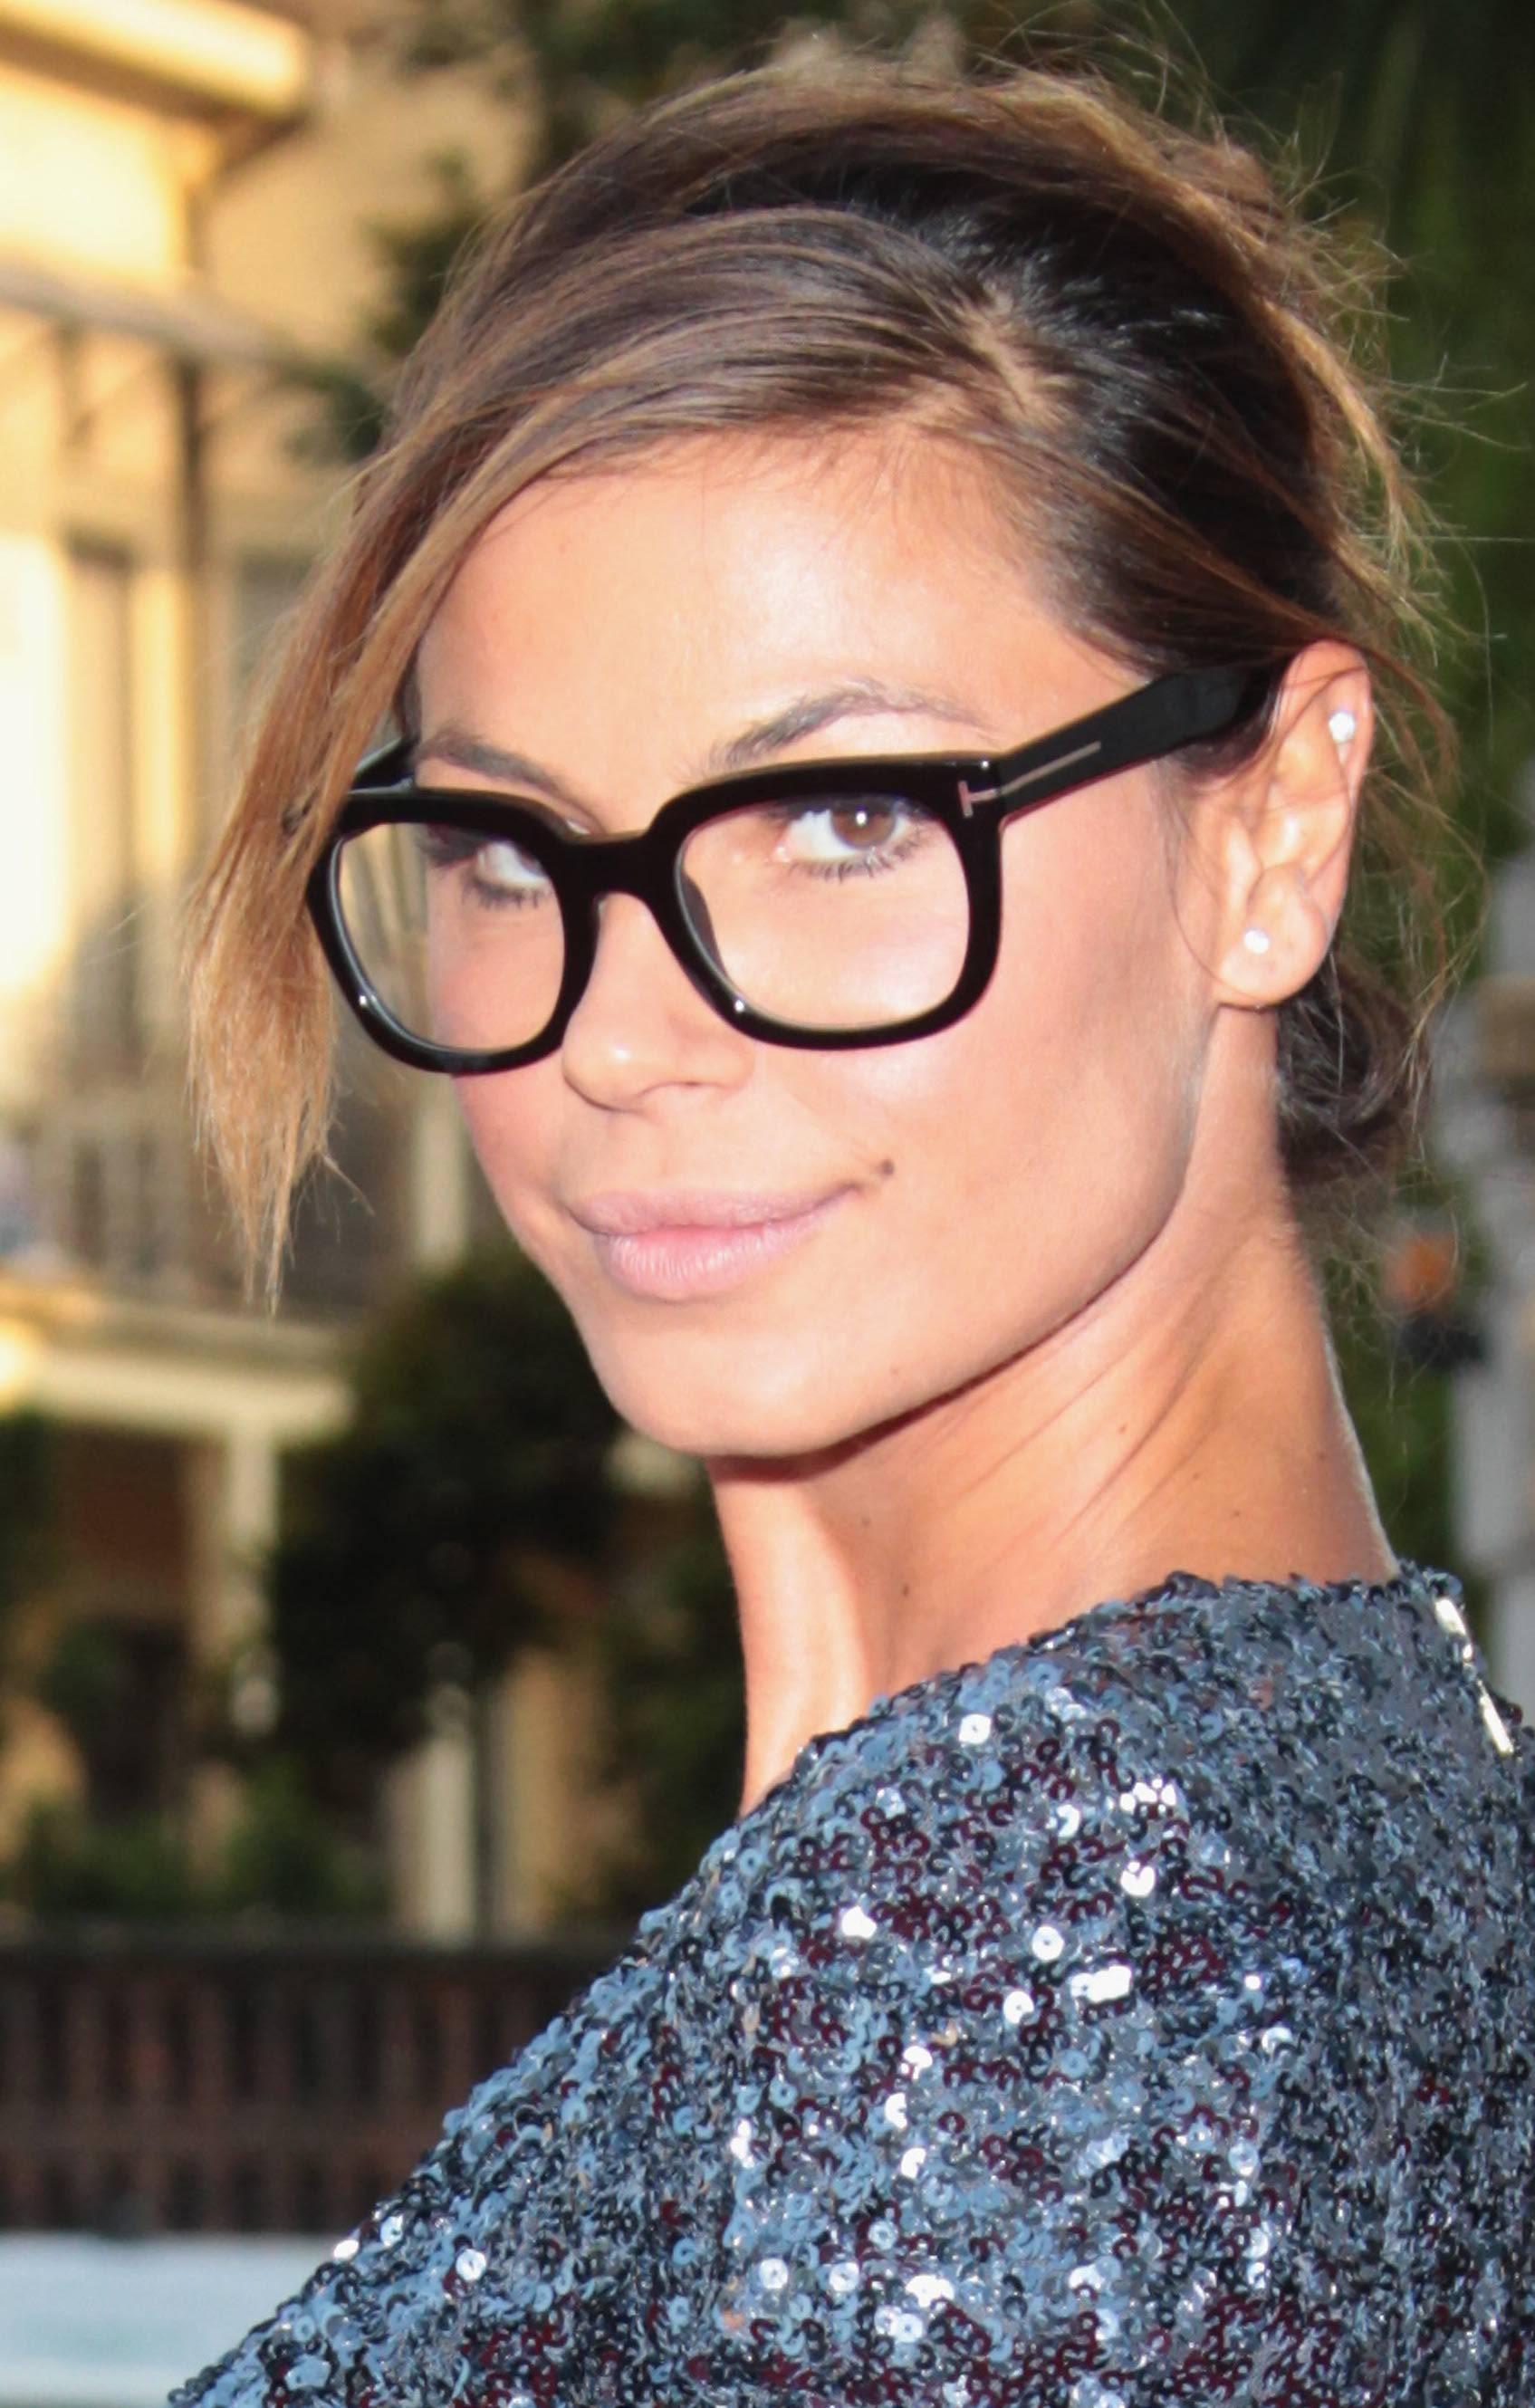 Eyeglasses Sunglasses F9r5